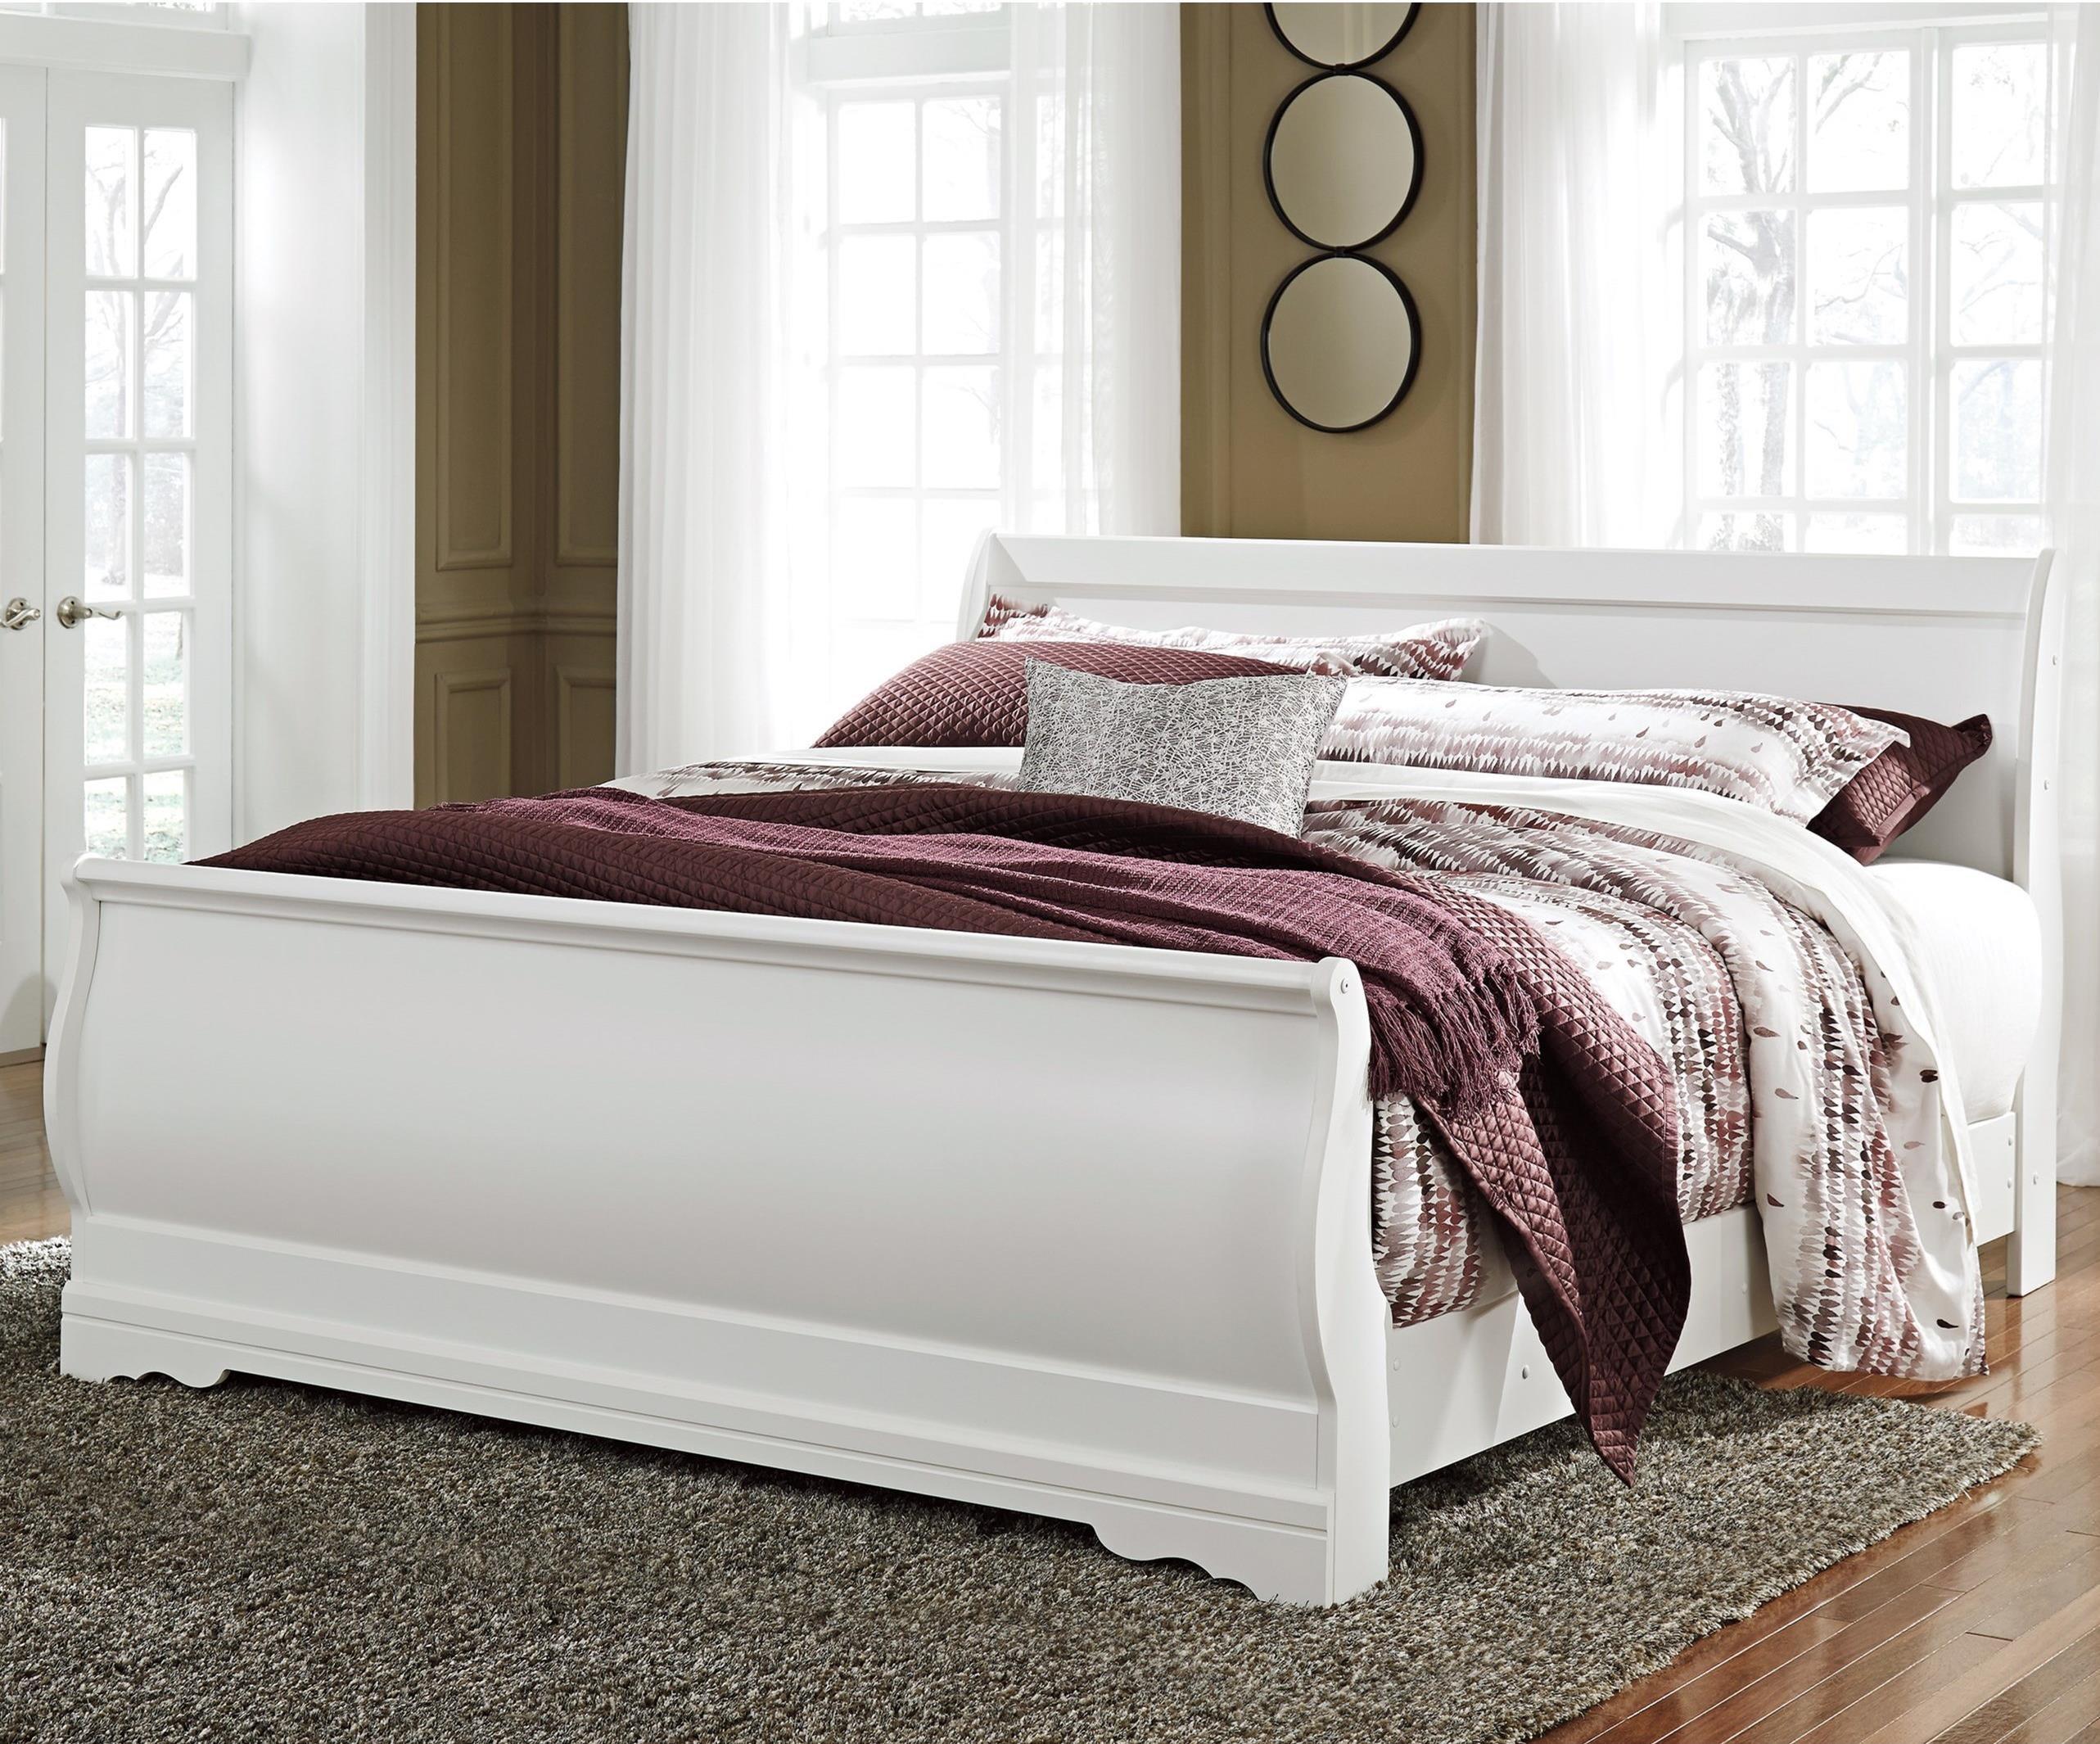 Anarasia King Sleigh Bed by Ashley (Signature Design) at Johnny Janosik